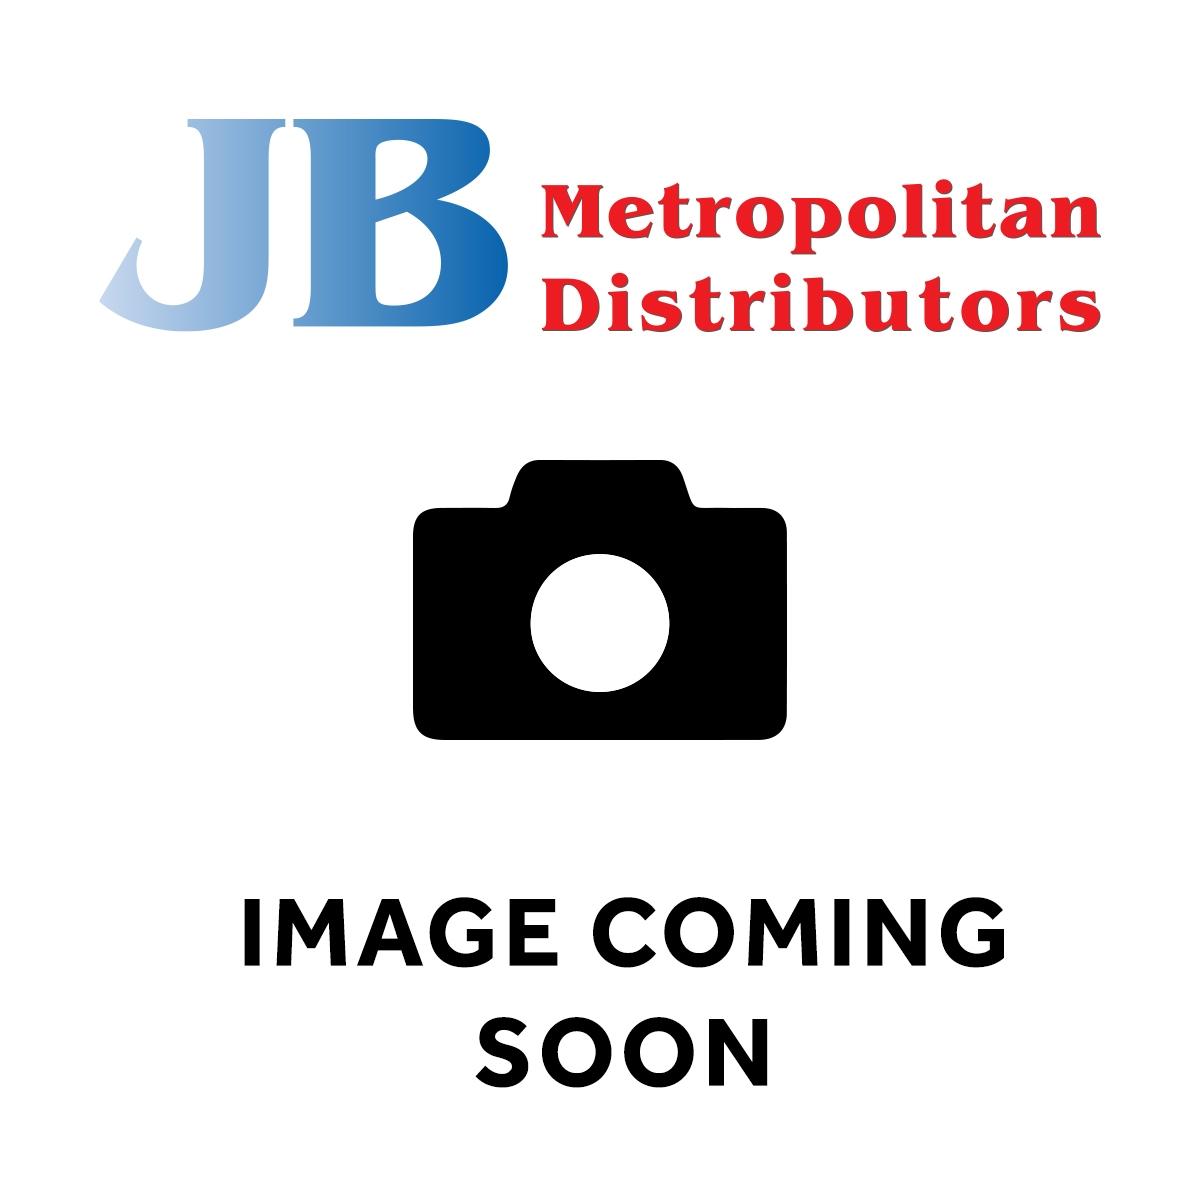 355ML RED BULL SUGAR FREE CANS